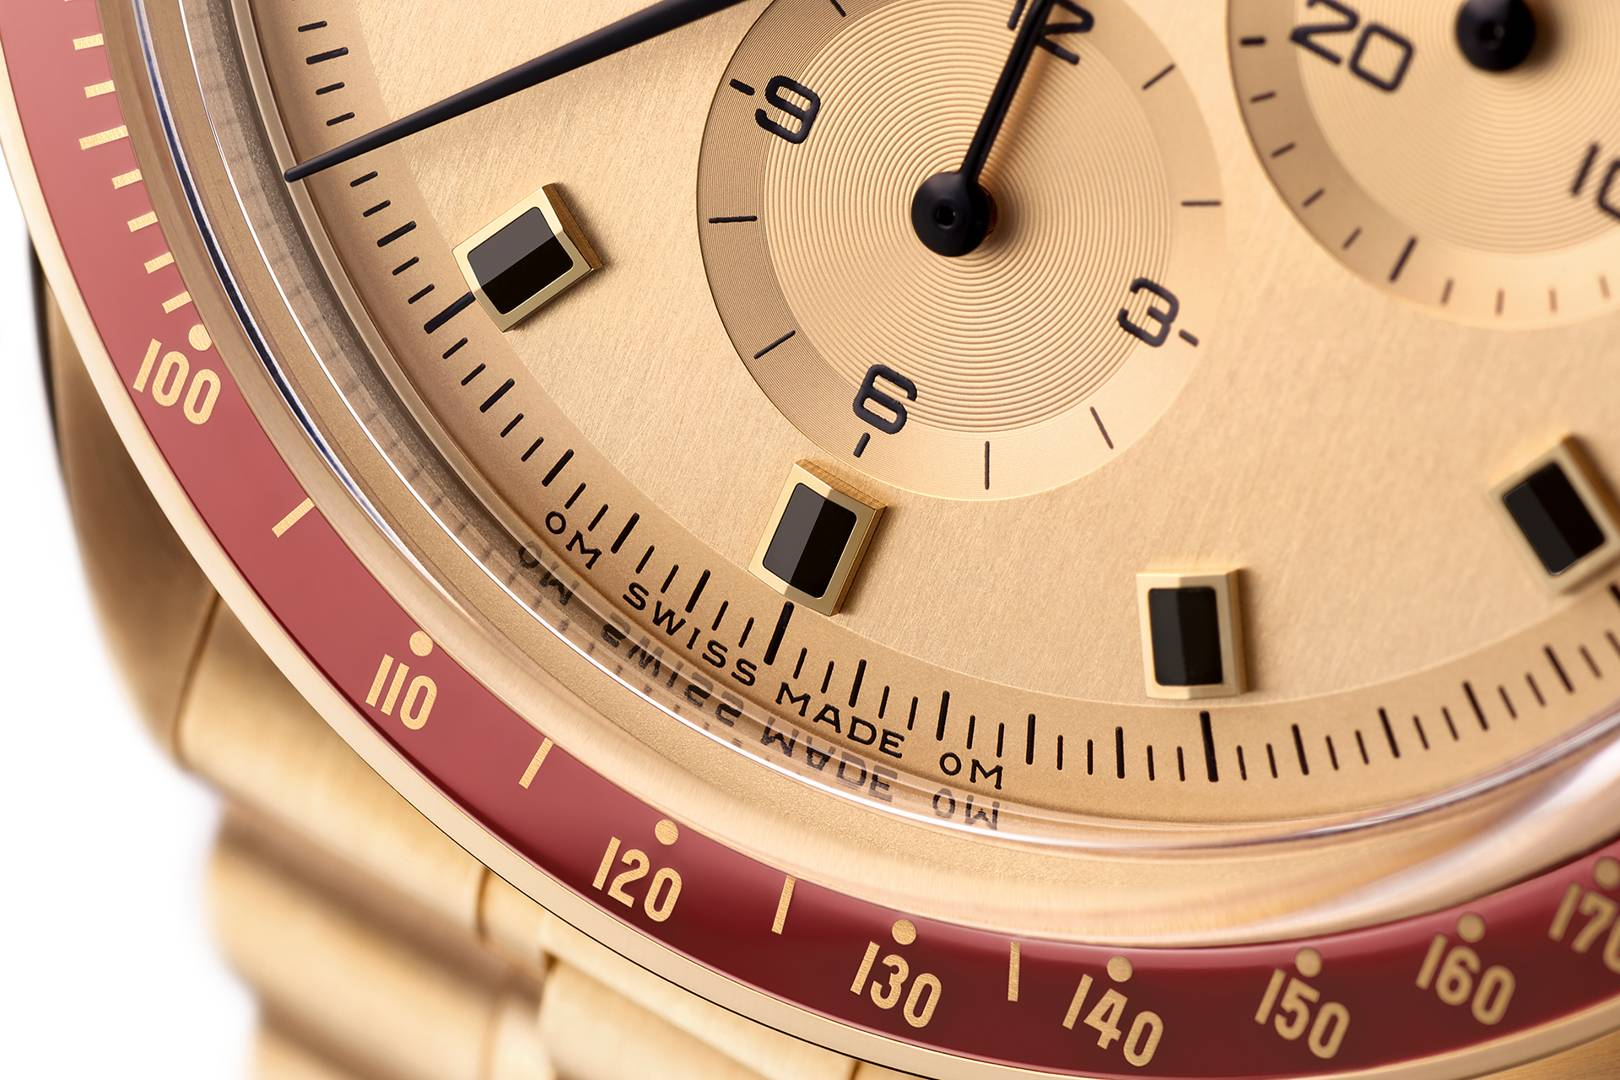 12d2bafd89f Omega Speedmaster Apollo 11 50th anniversary | British GQ